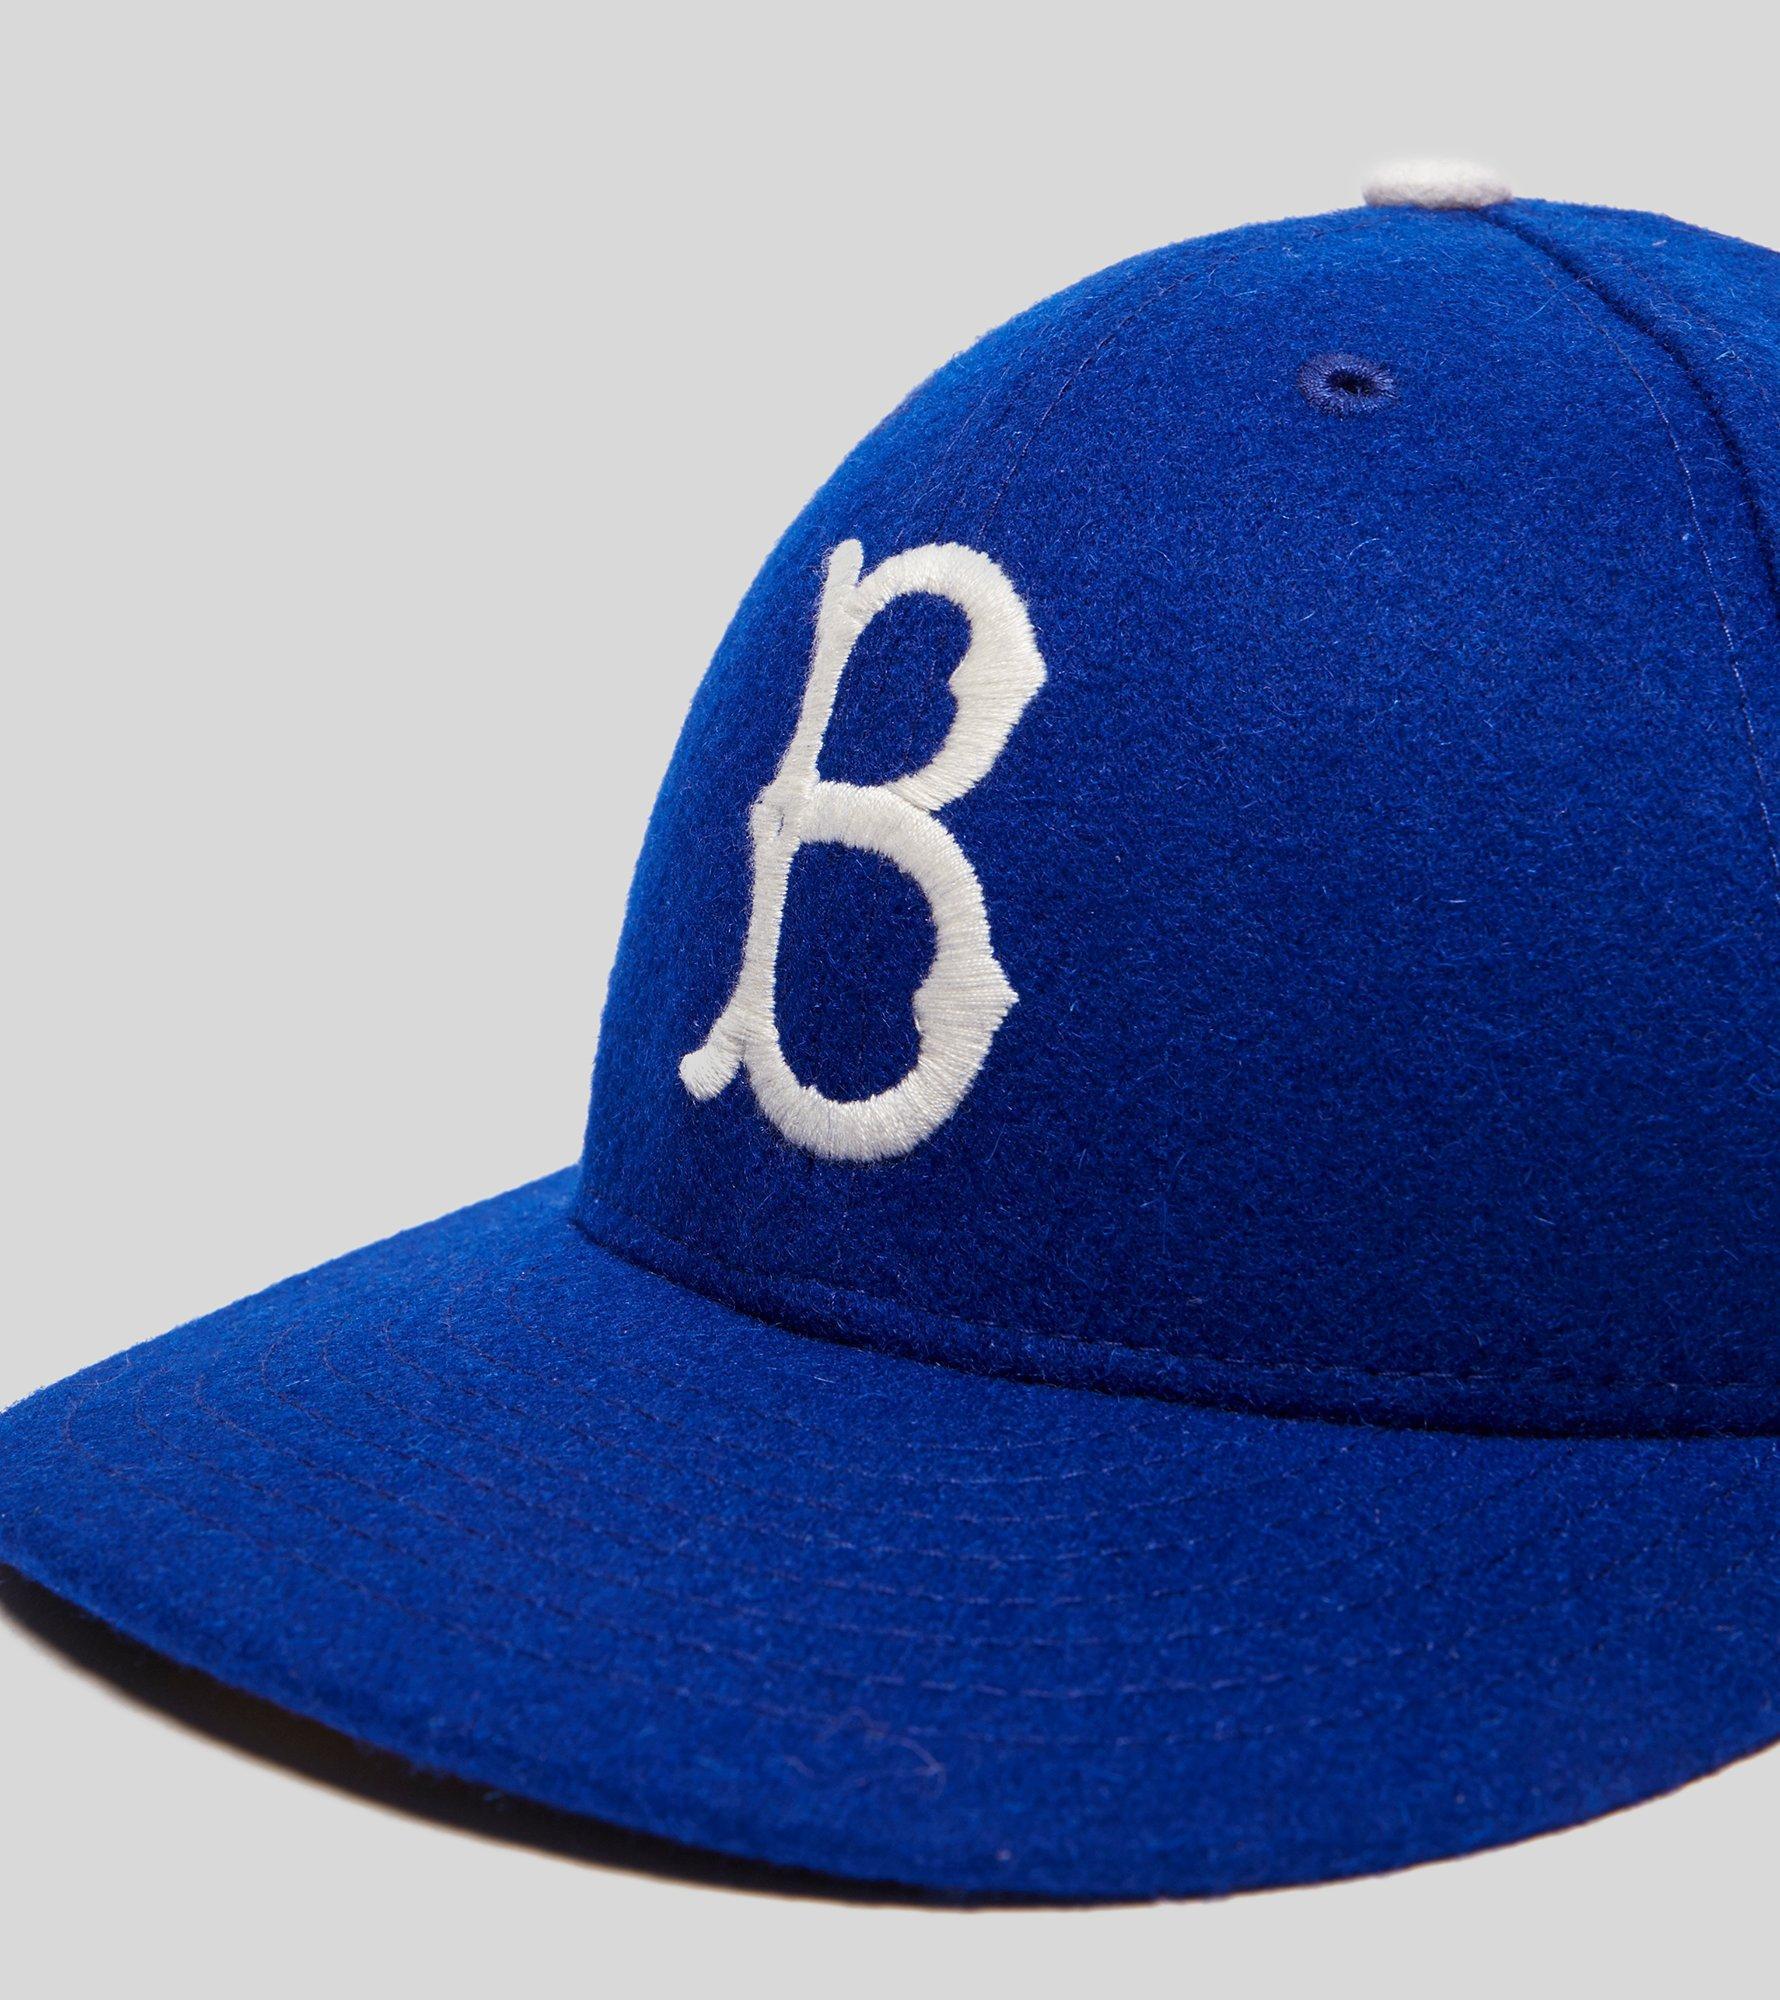 Lyst - KTZ 59fifty Low Profile Brooklyn Dodgers Cap in Blue for Men d1429e412b0